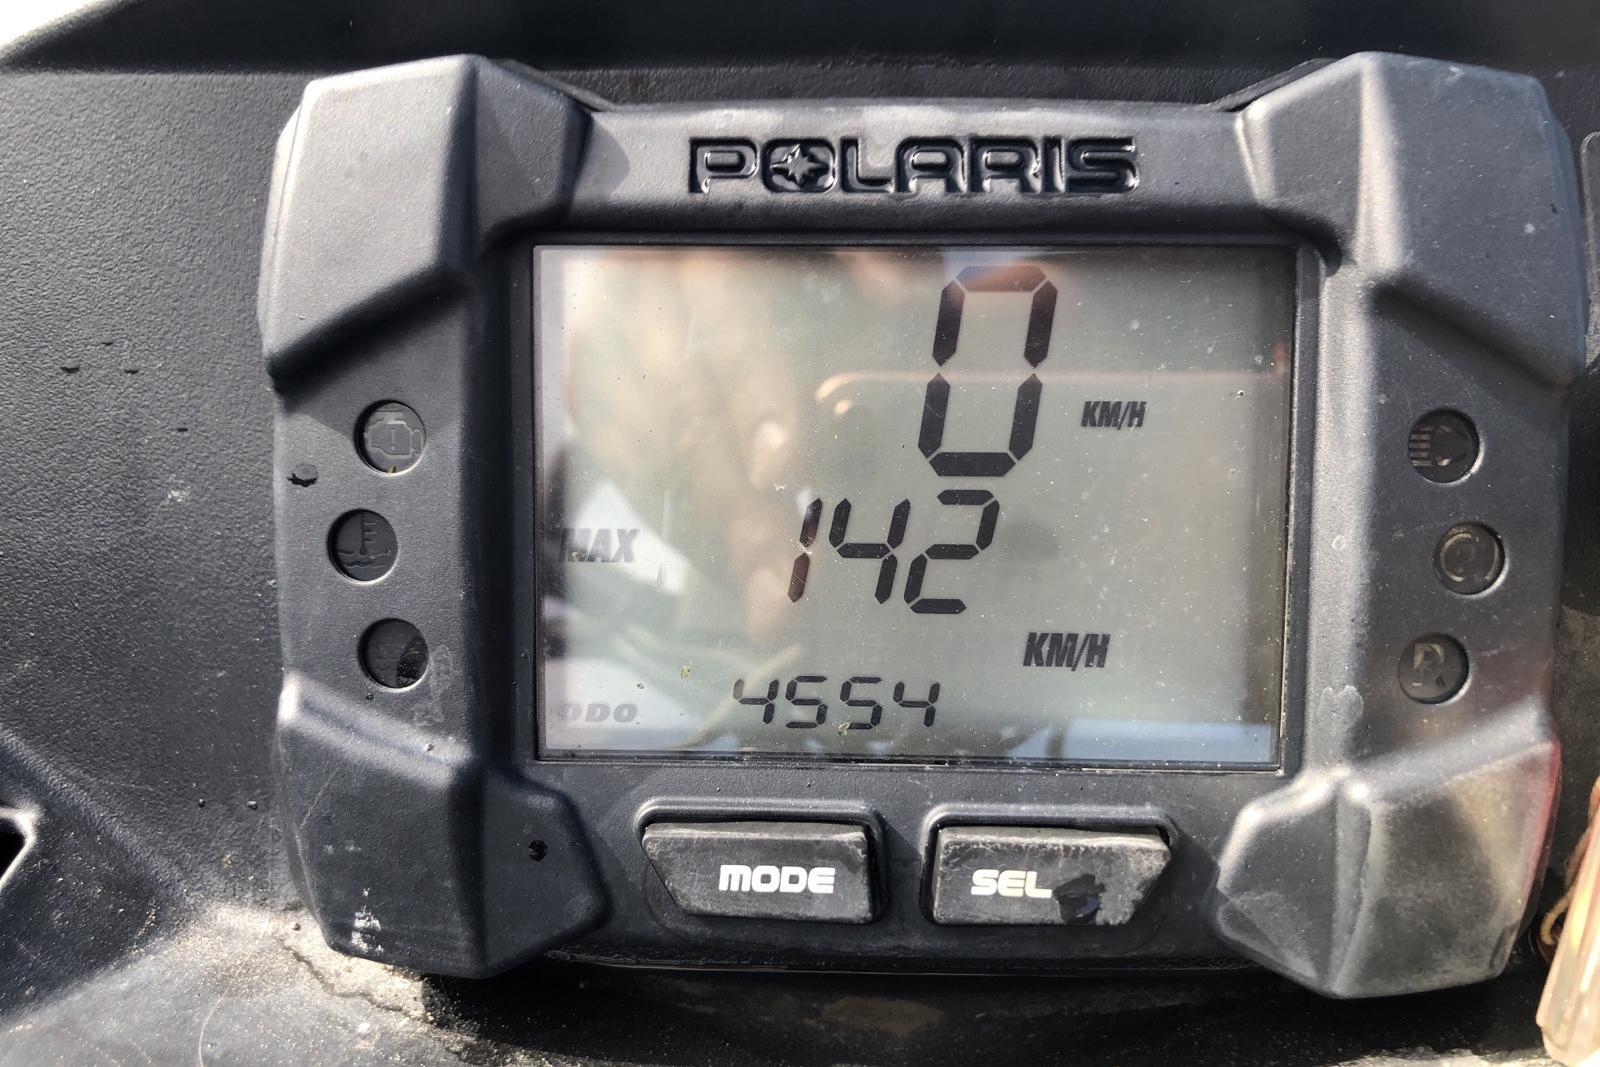 POLARIS RMK 600 155 Snöskoter - 455 mil - Automat - blå - 2014